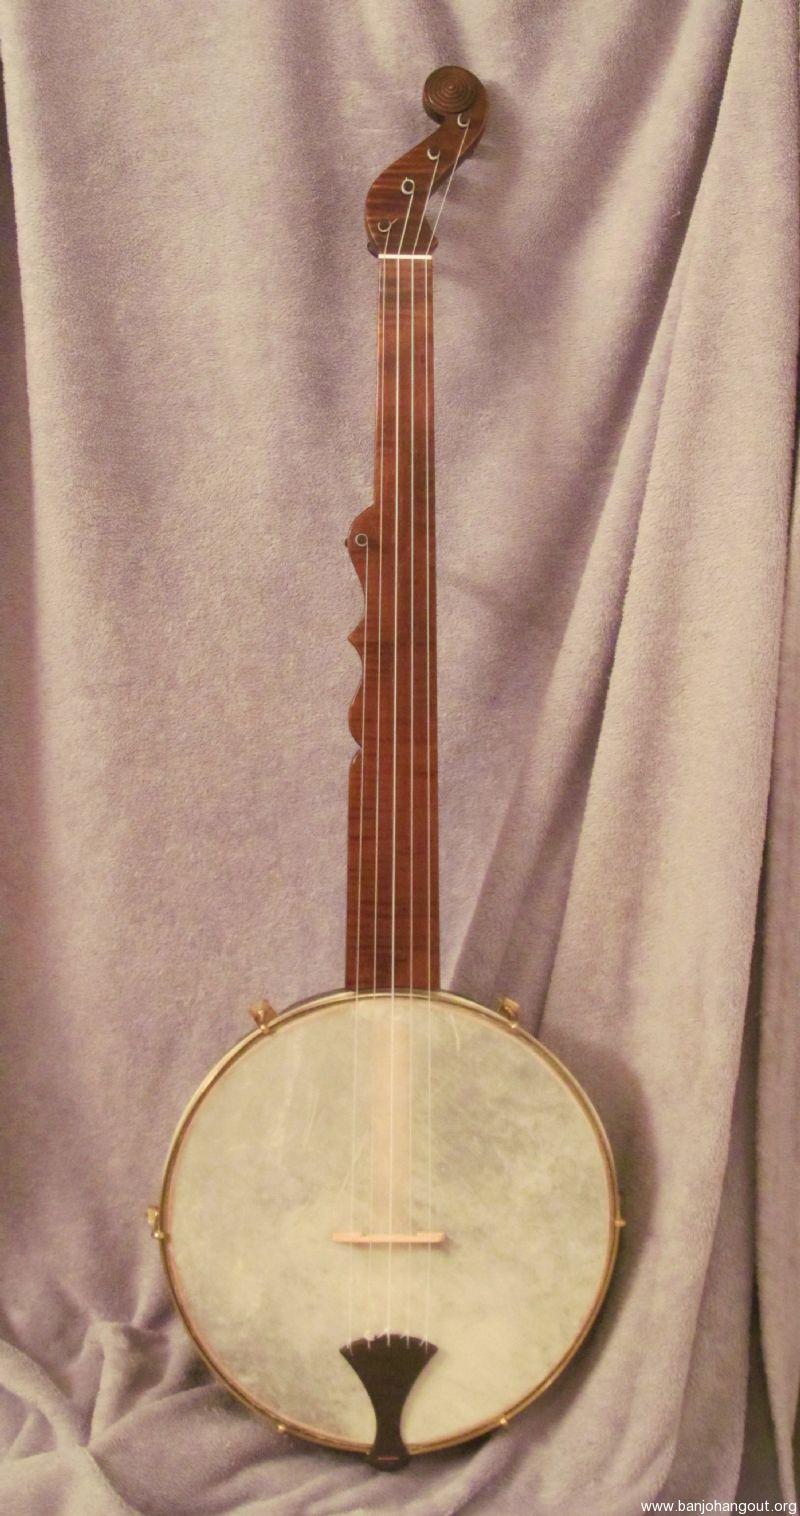 MINSTREL BANJO New Boucher Style - Used Banjo For Sale at